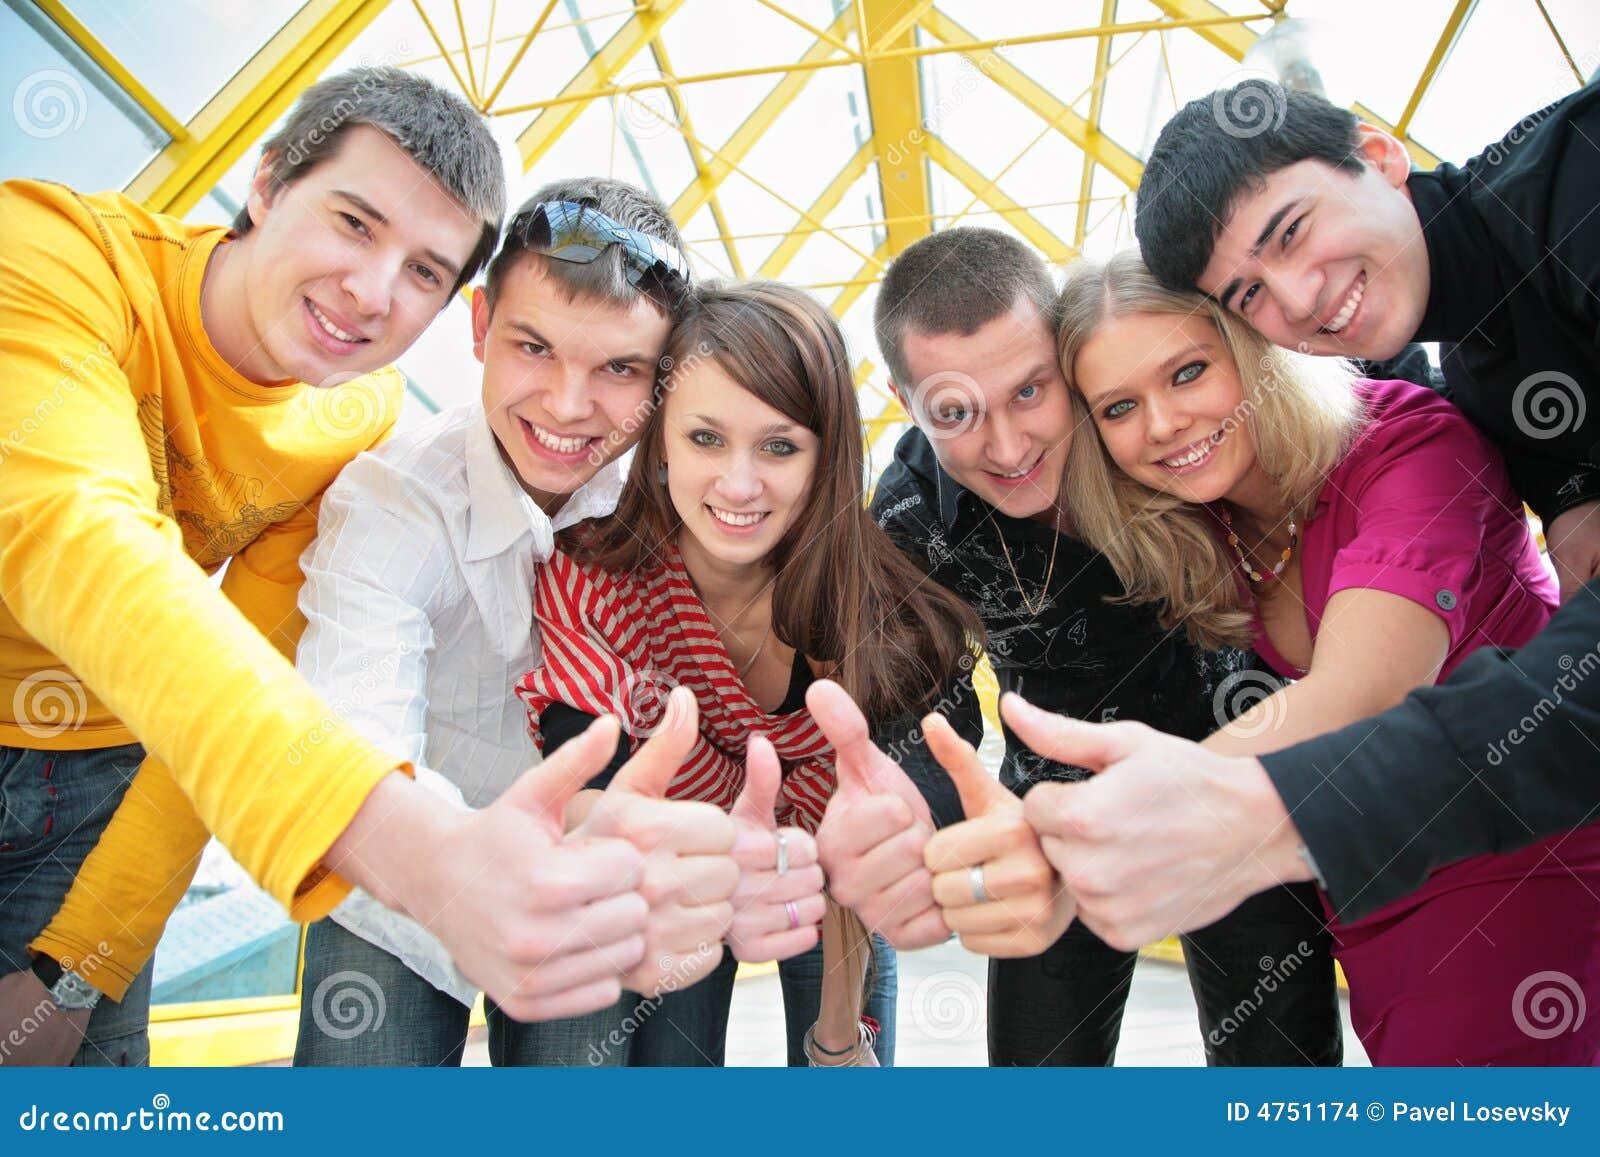 Фото домашнее молодежи